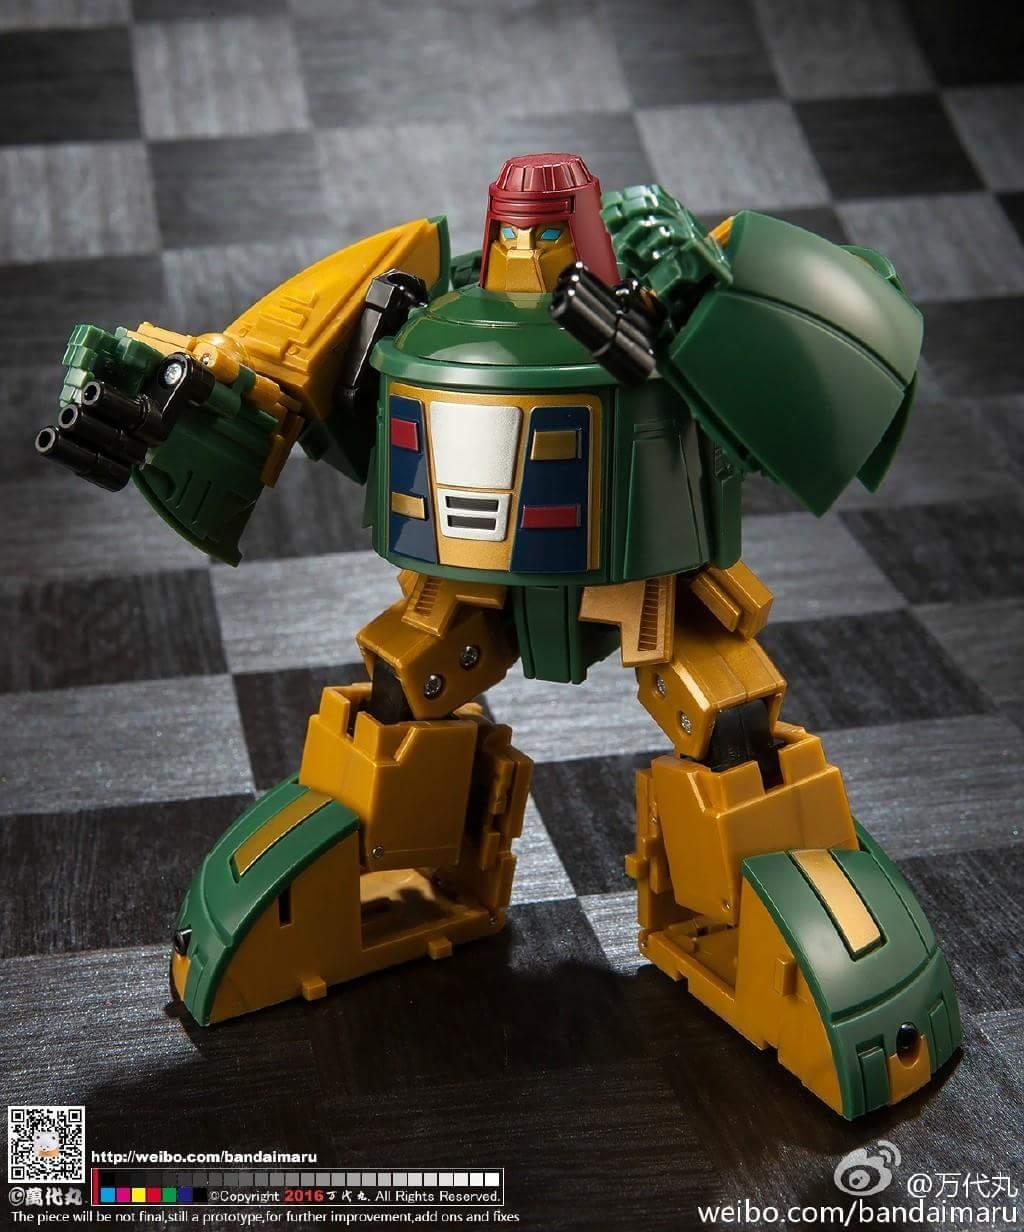 [Toyworld][Zeta Toys] Produit Tiers - Minibots MP - Gamme EX - Page 2 RVhKUgAS